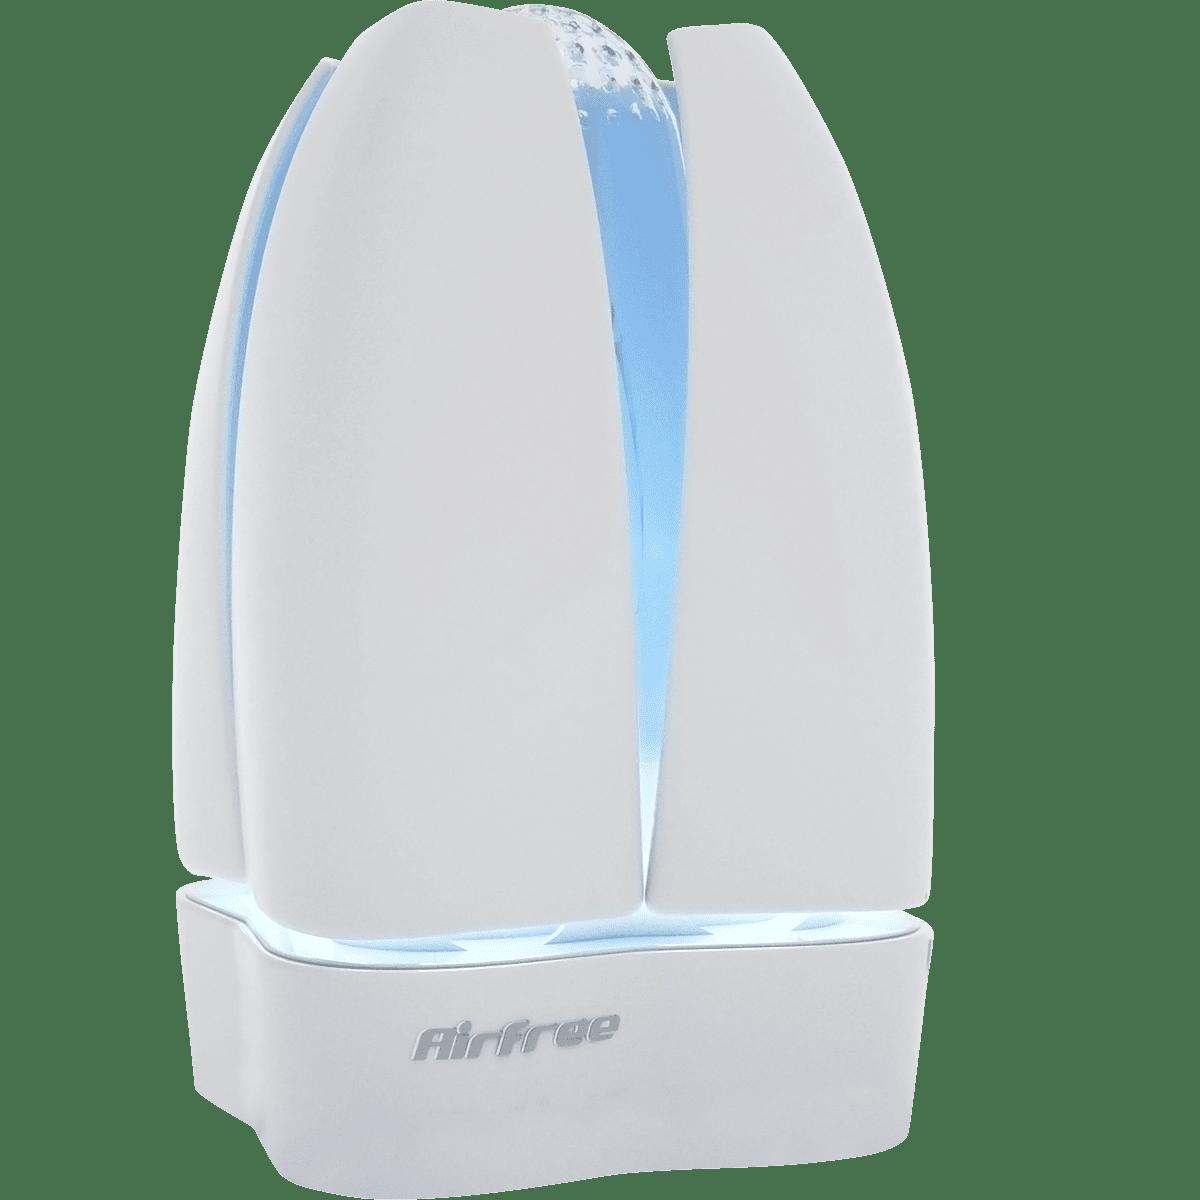 AirFree Lotus Filterless Air Purifier & Sterilizer ai5165